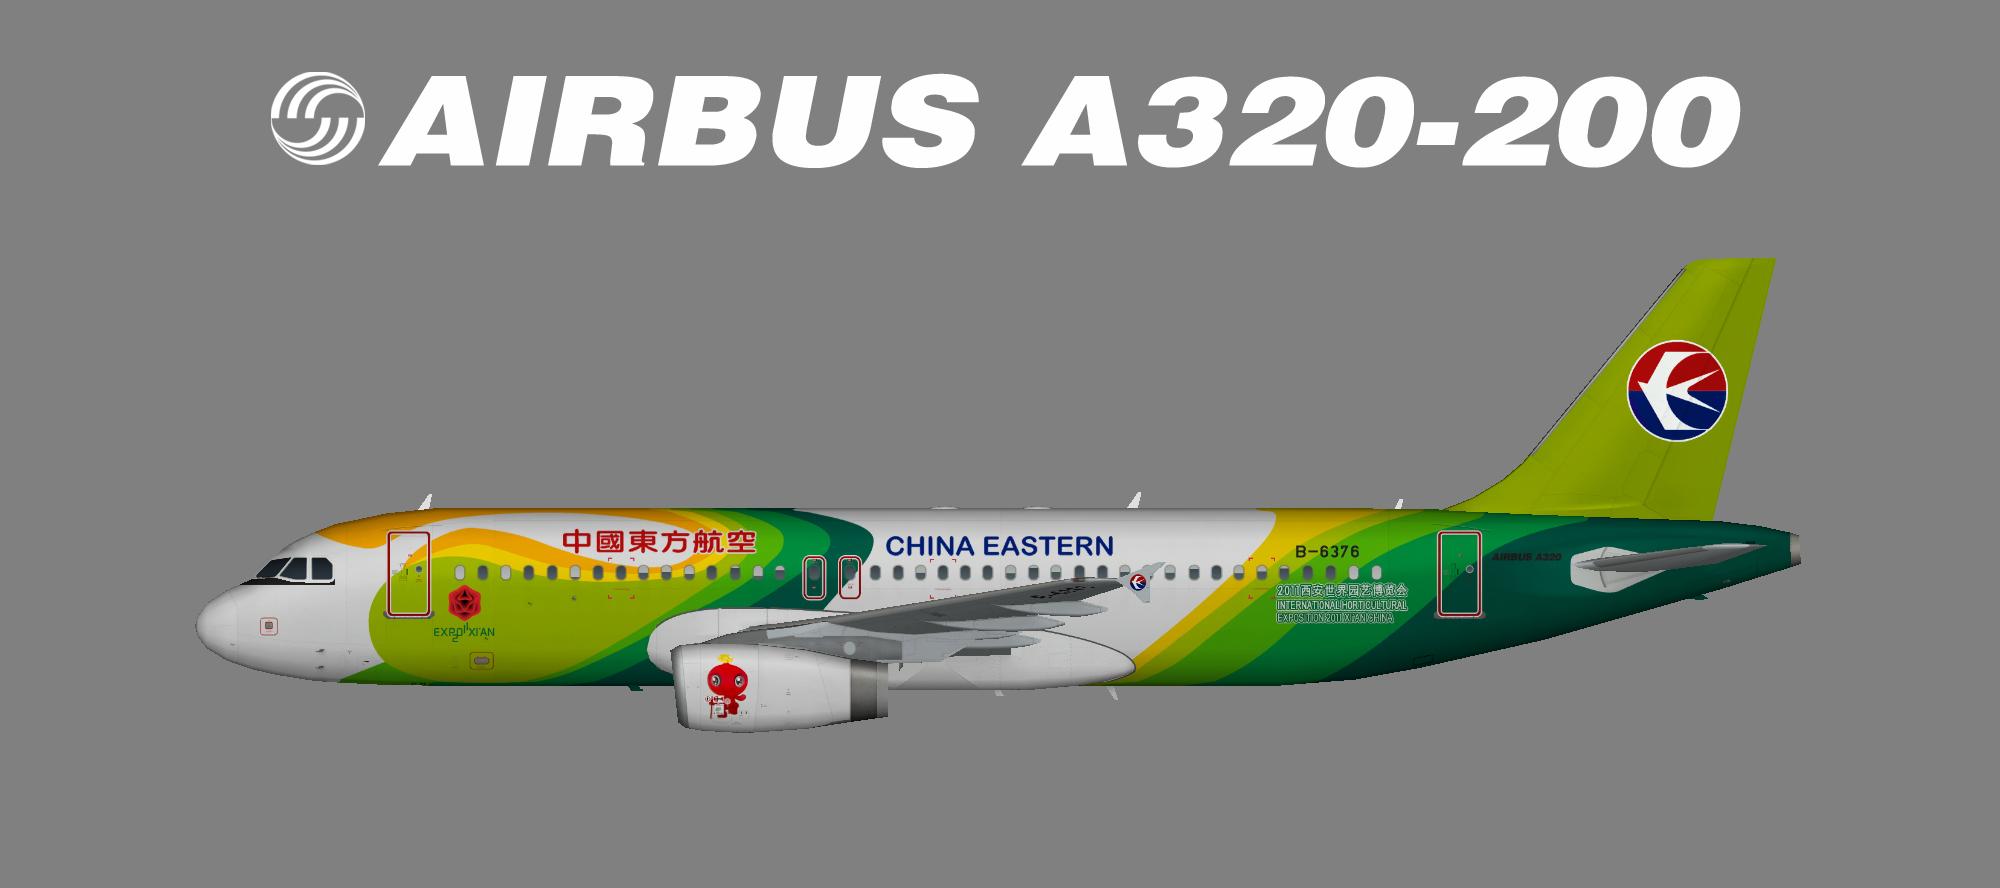 China Eastern – Juergen's paint hangar